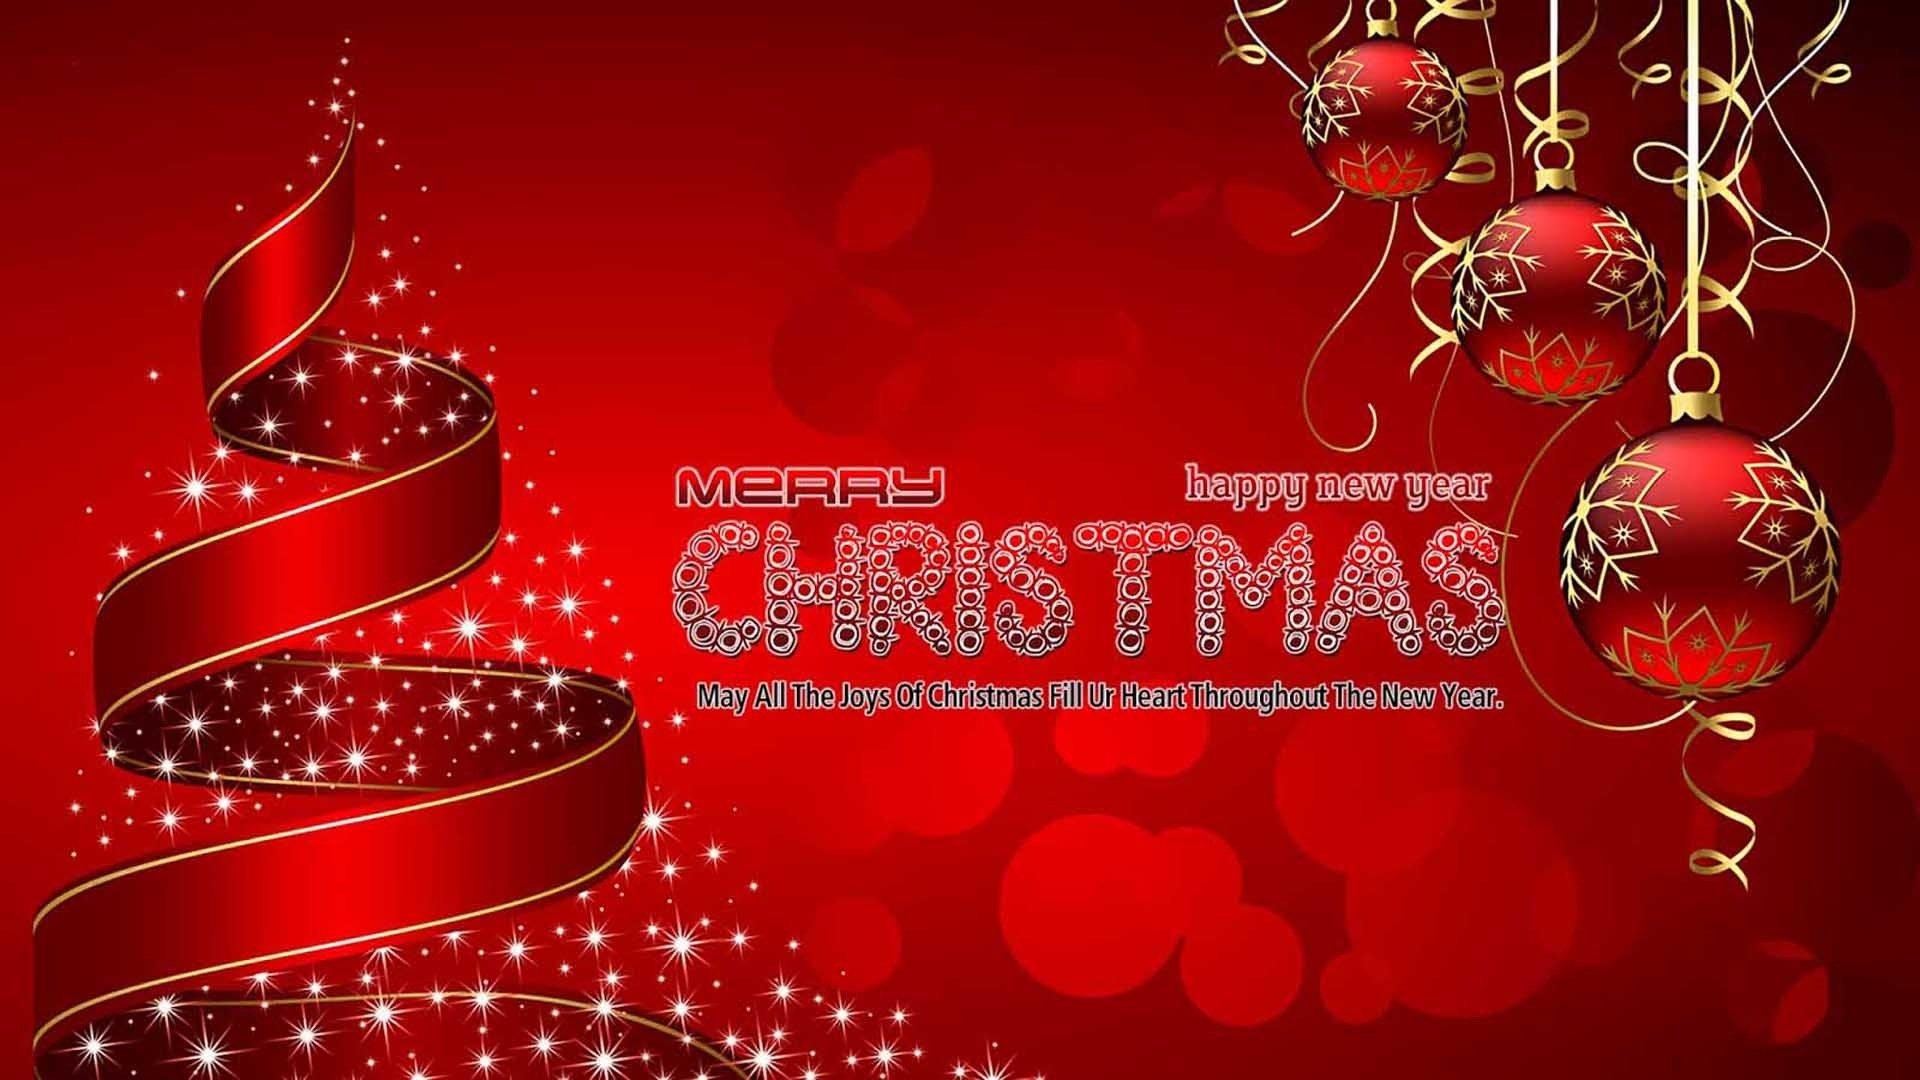 Merry Christmas Happy New Year 2020 Christmas Greetings Desktop Hd 1920x1080